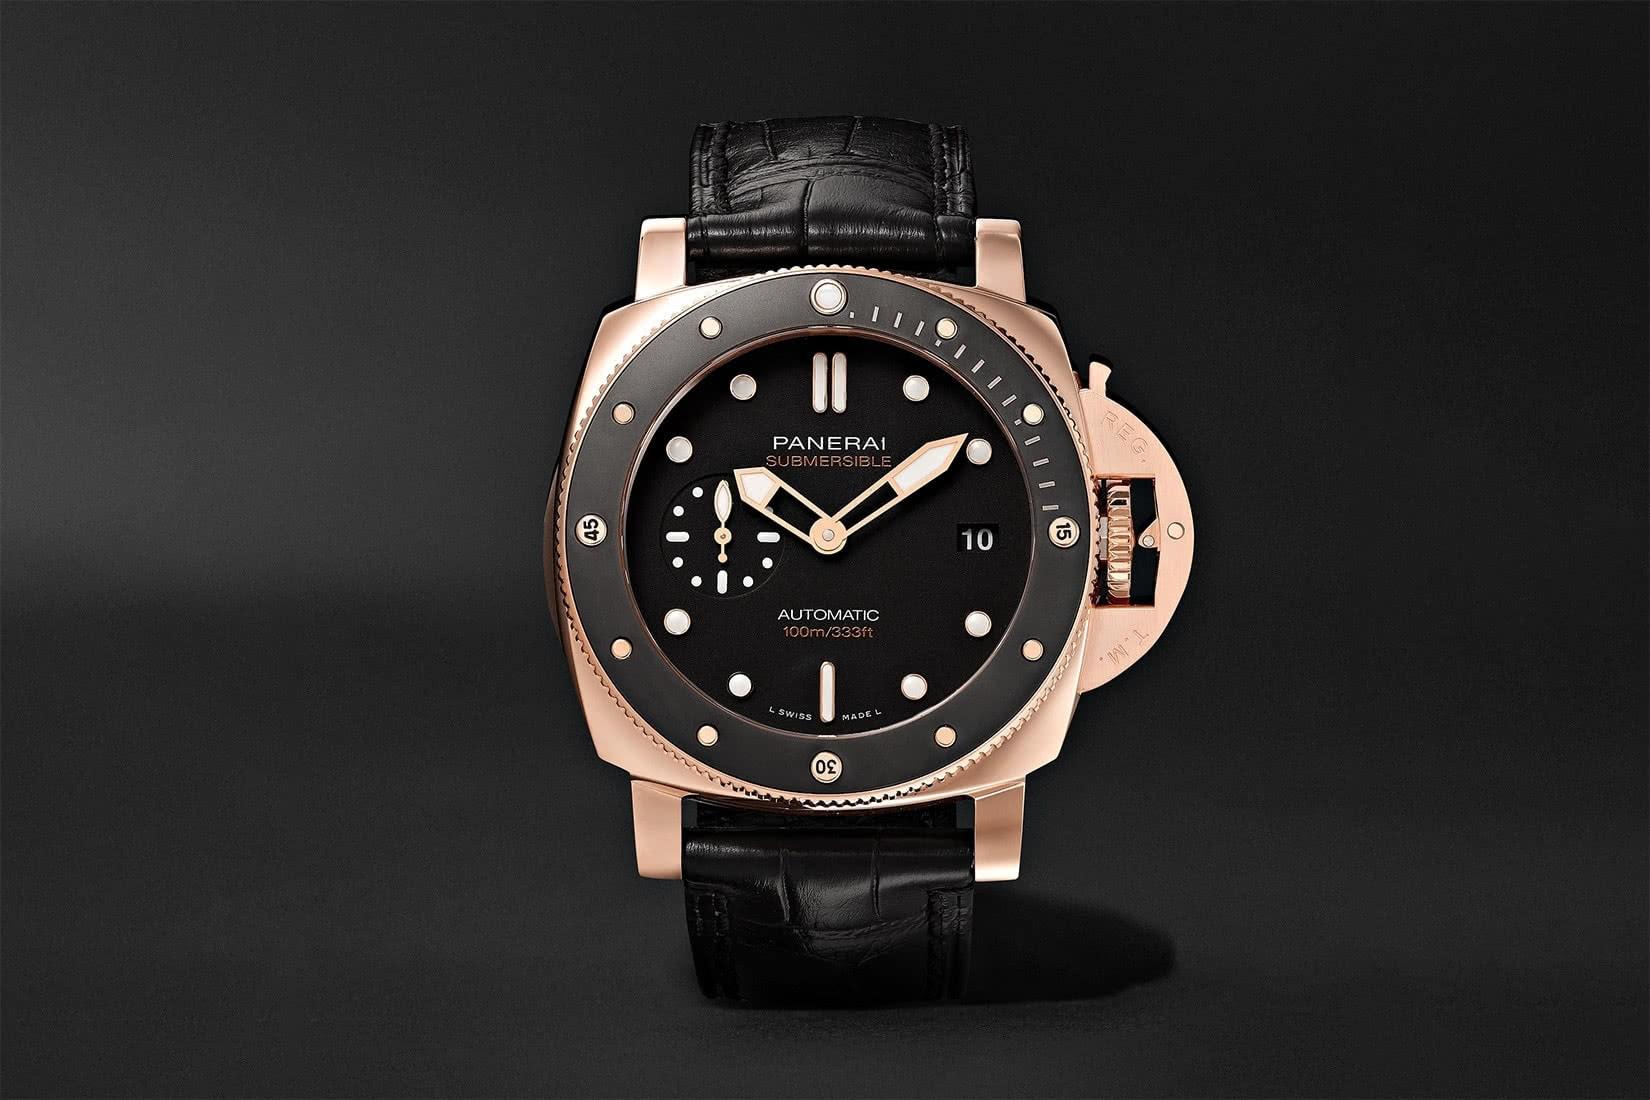 best men watch panerai submersible review - Luxe Digital